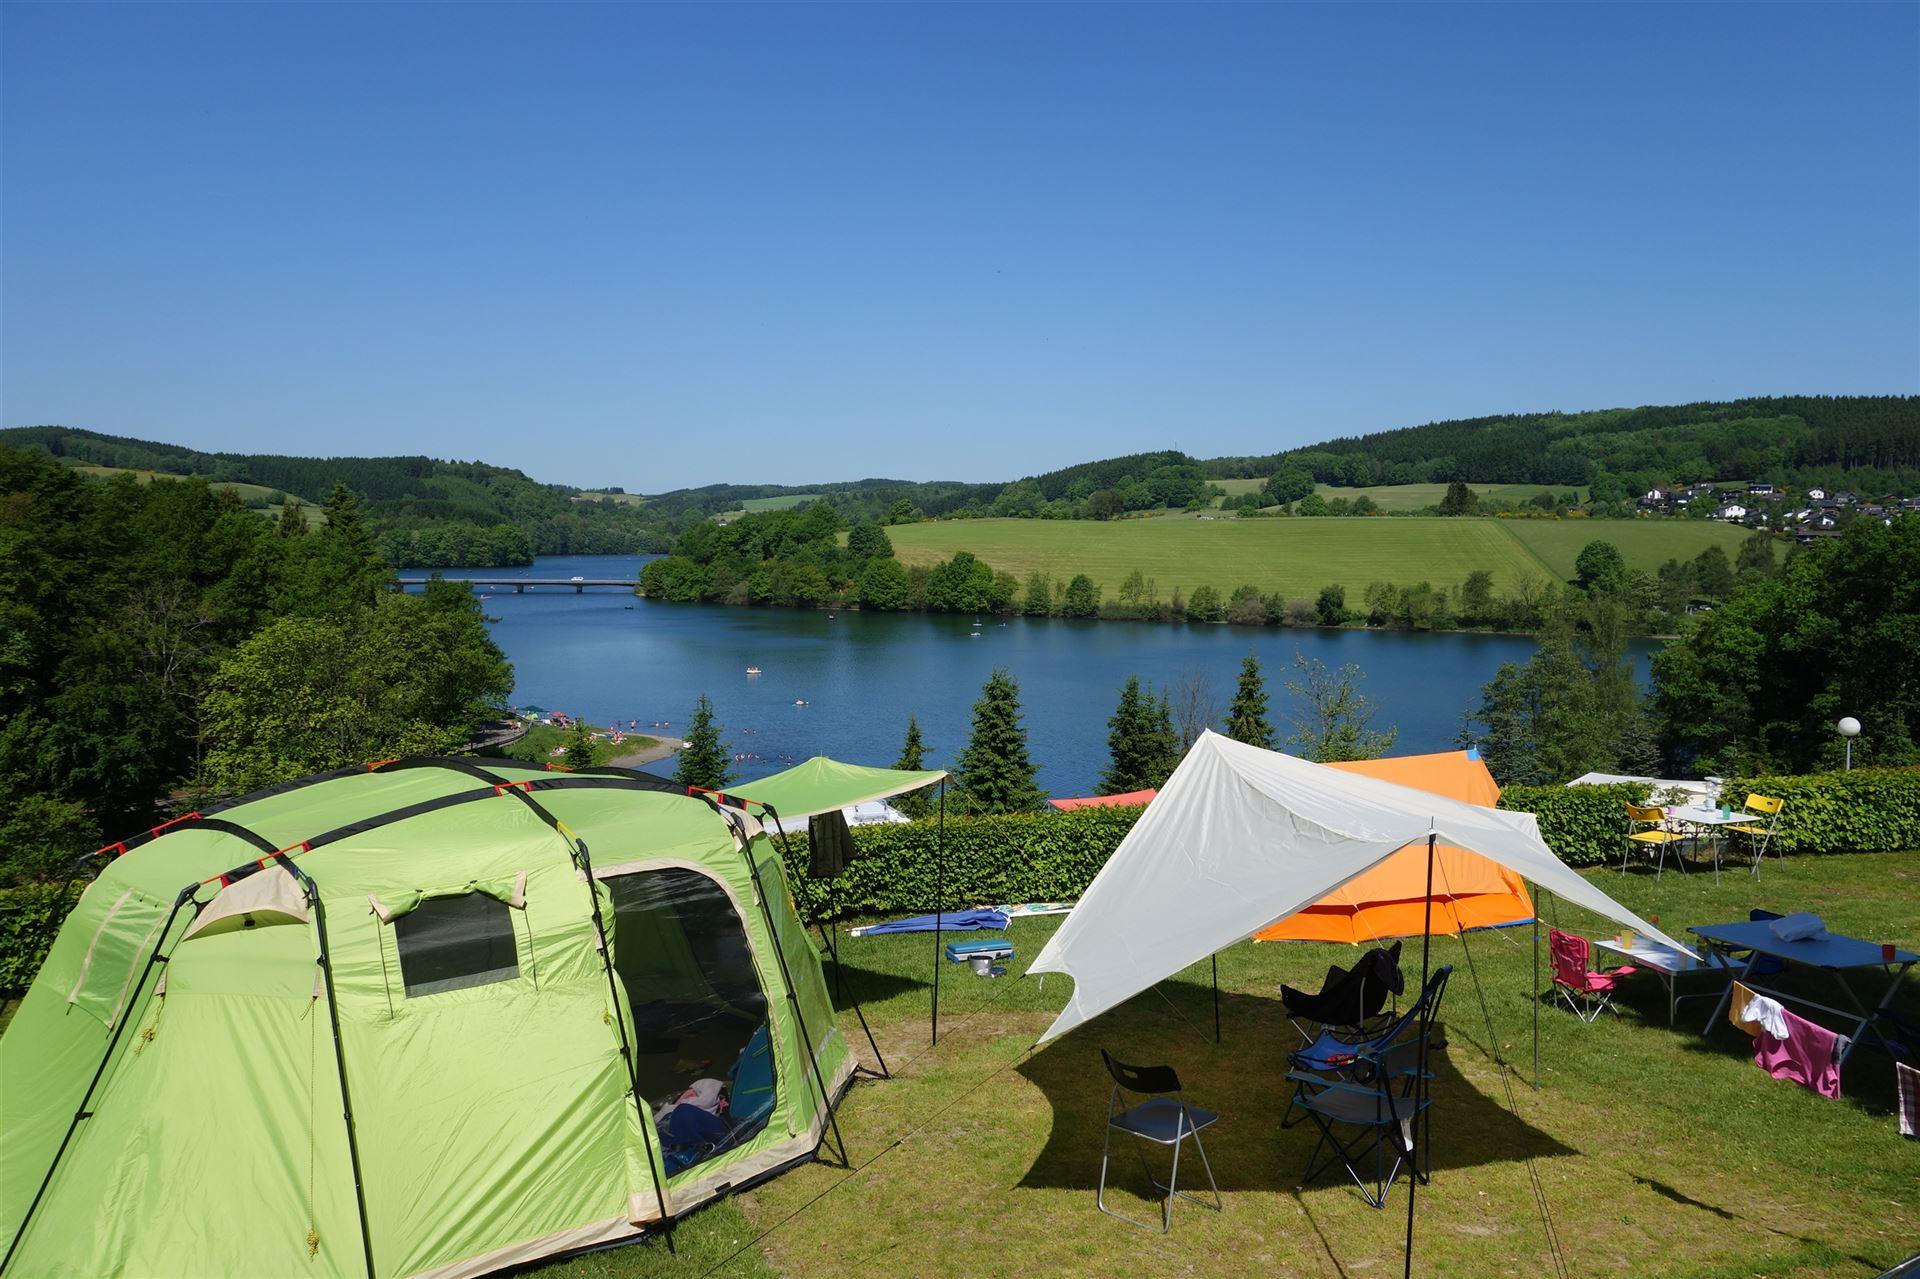 Spiegel Aan Ketting : Camping gut kalberschnacke ****